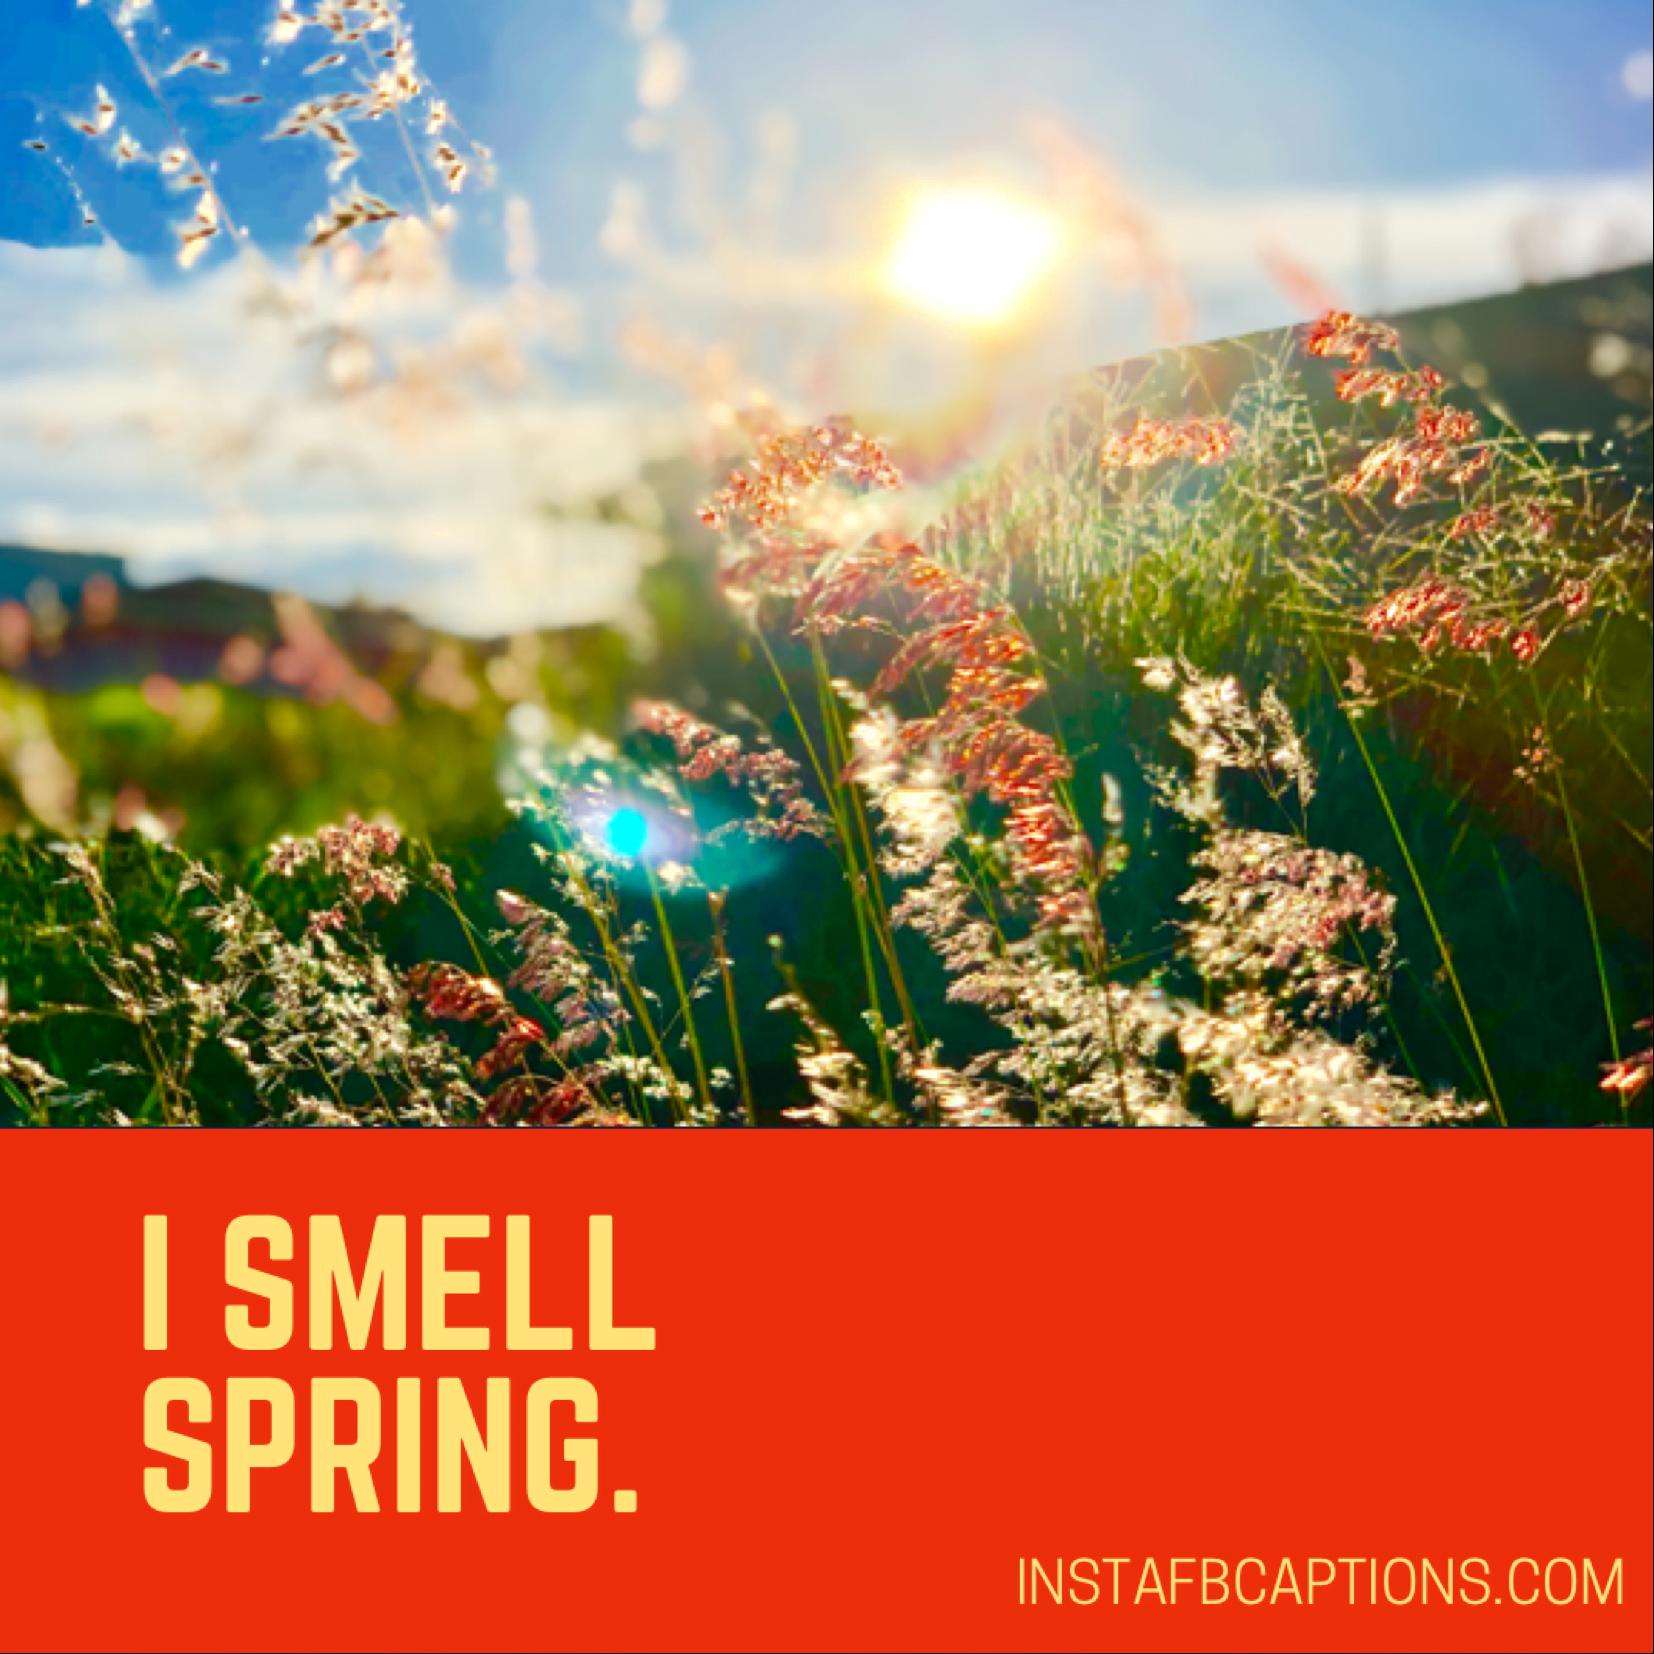 One Line Spring Captions  - One Line Spring Captions - 150+ Best SPRING Instagram Captions 2021